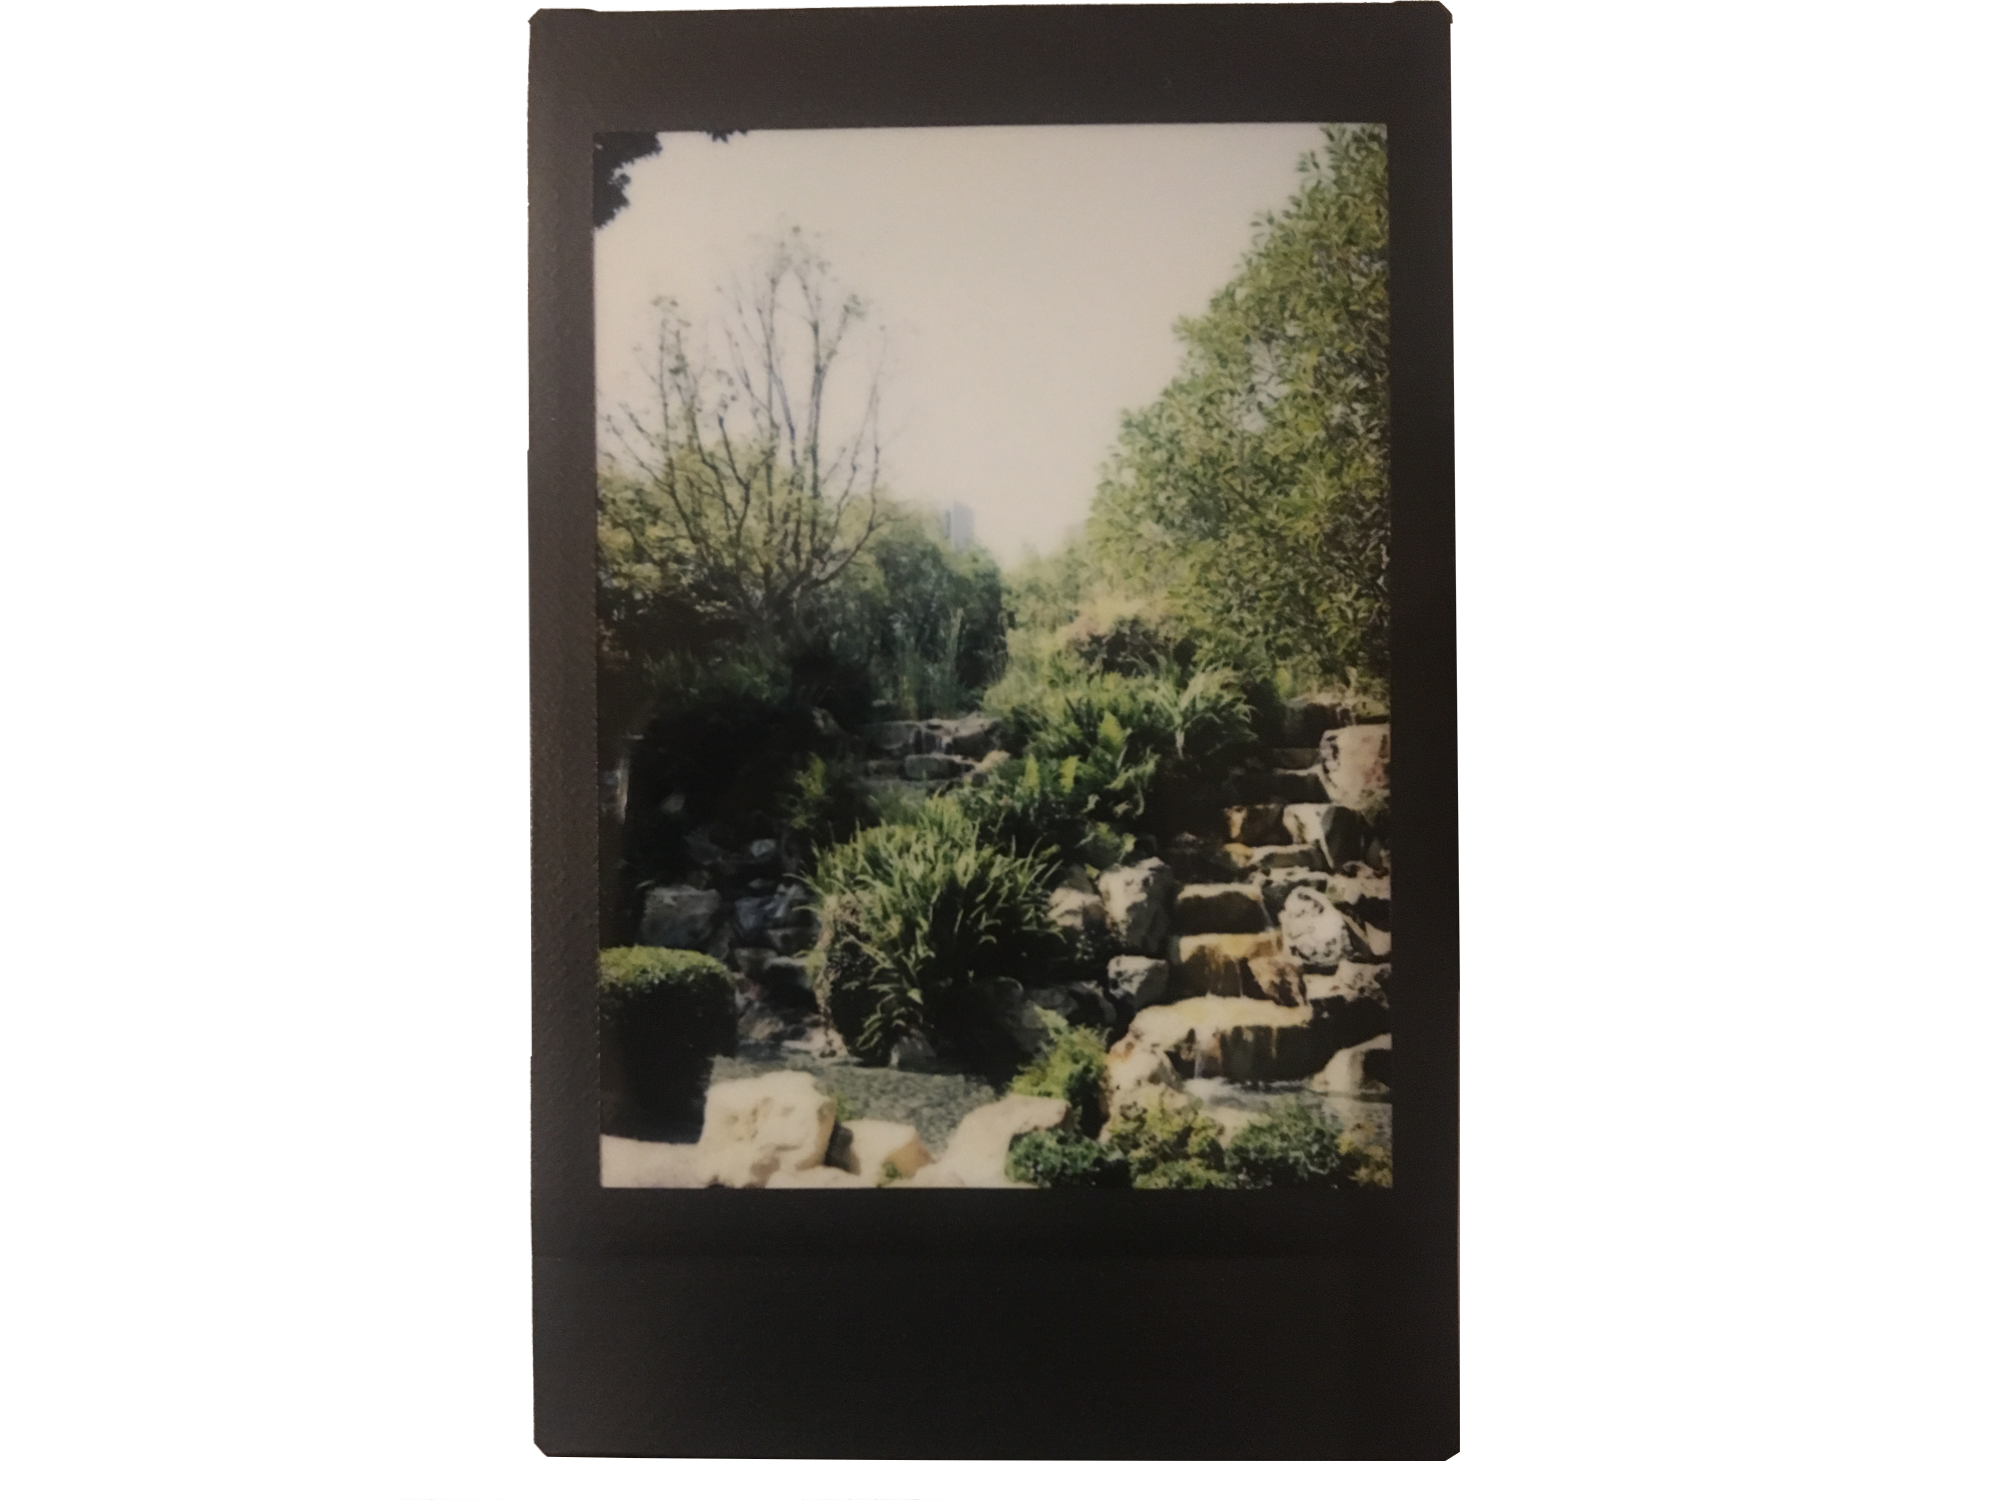 Japanese oasis in DTLA  Los Angeles, California, USA